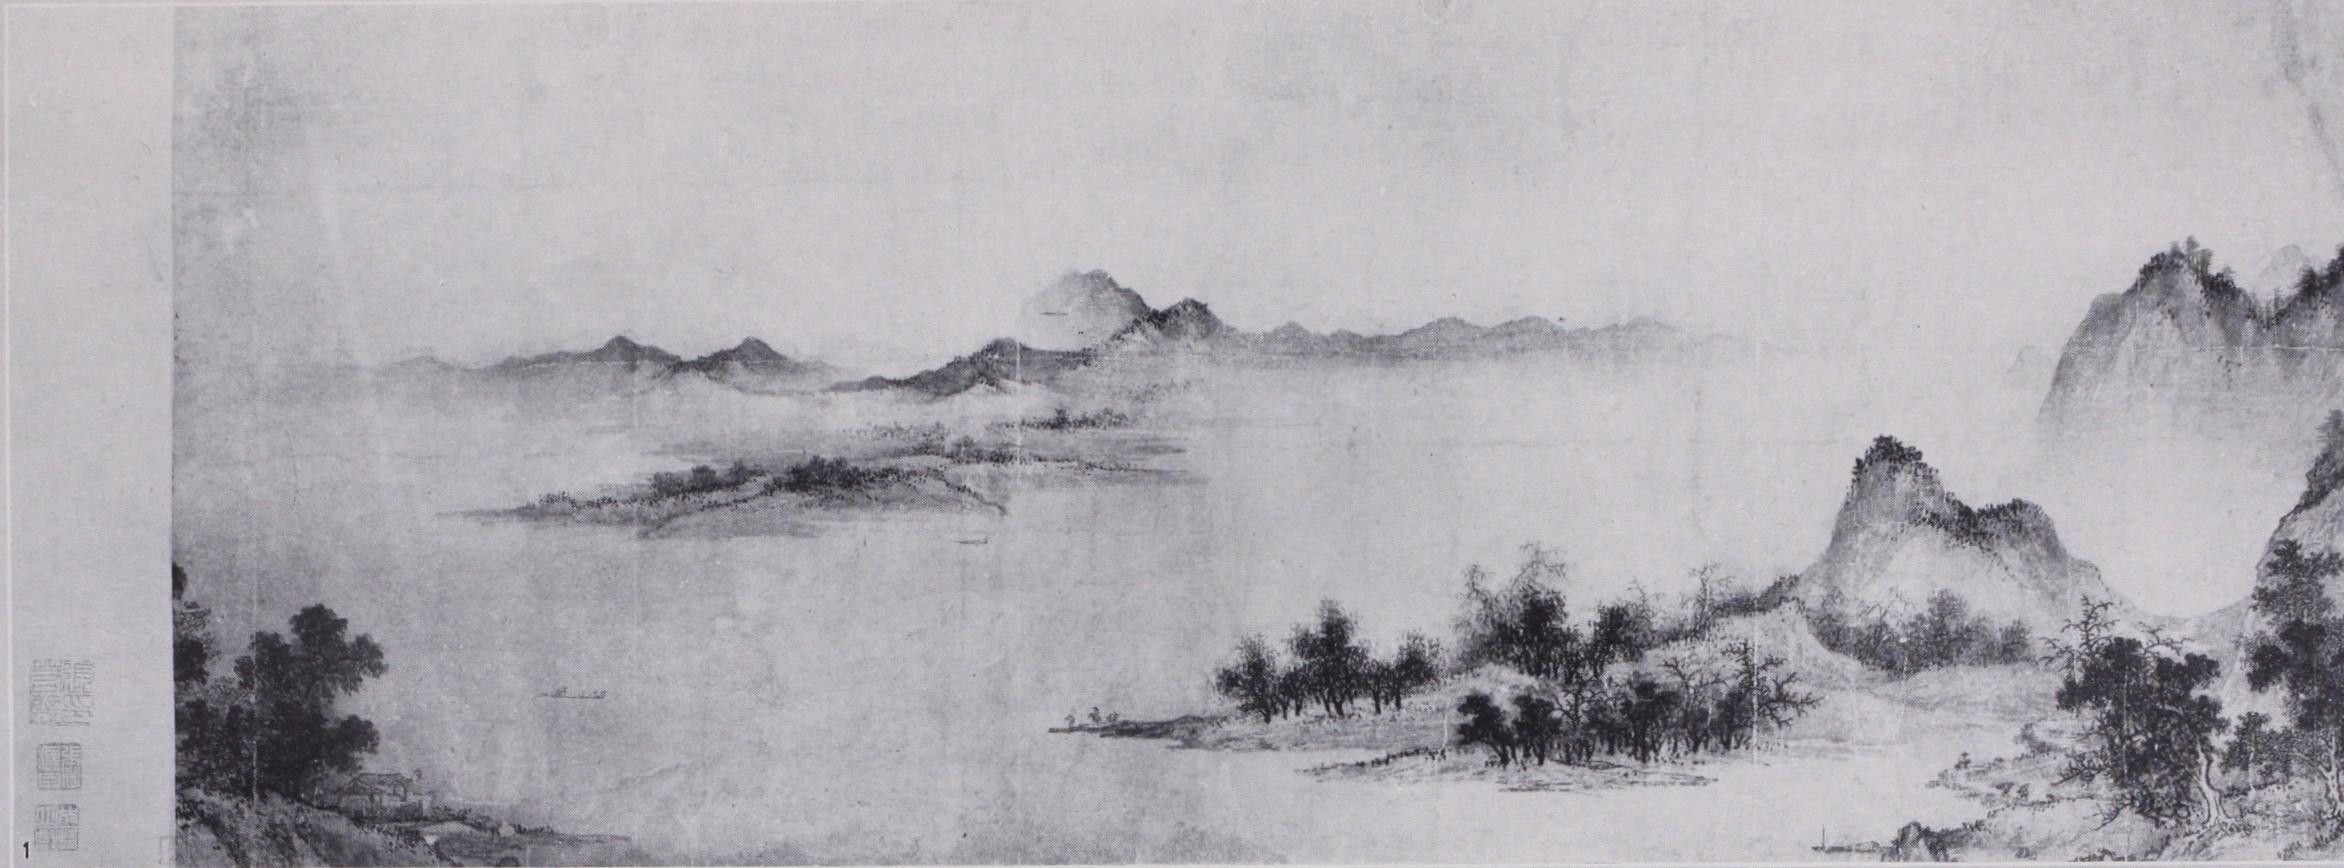 vertical japanese landscape painting | newyorkutazas.info ...